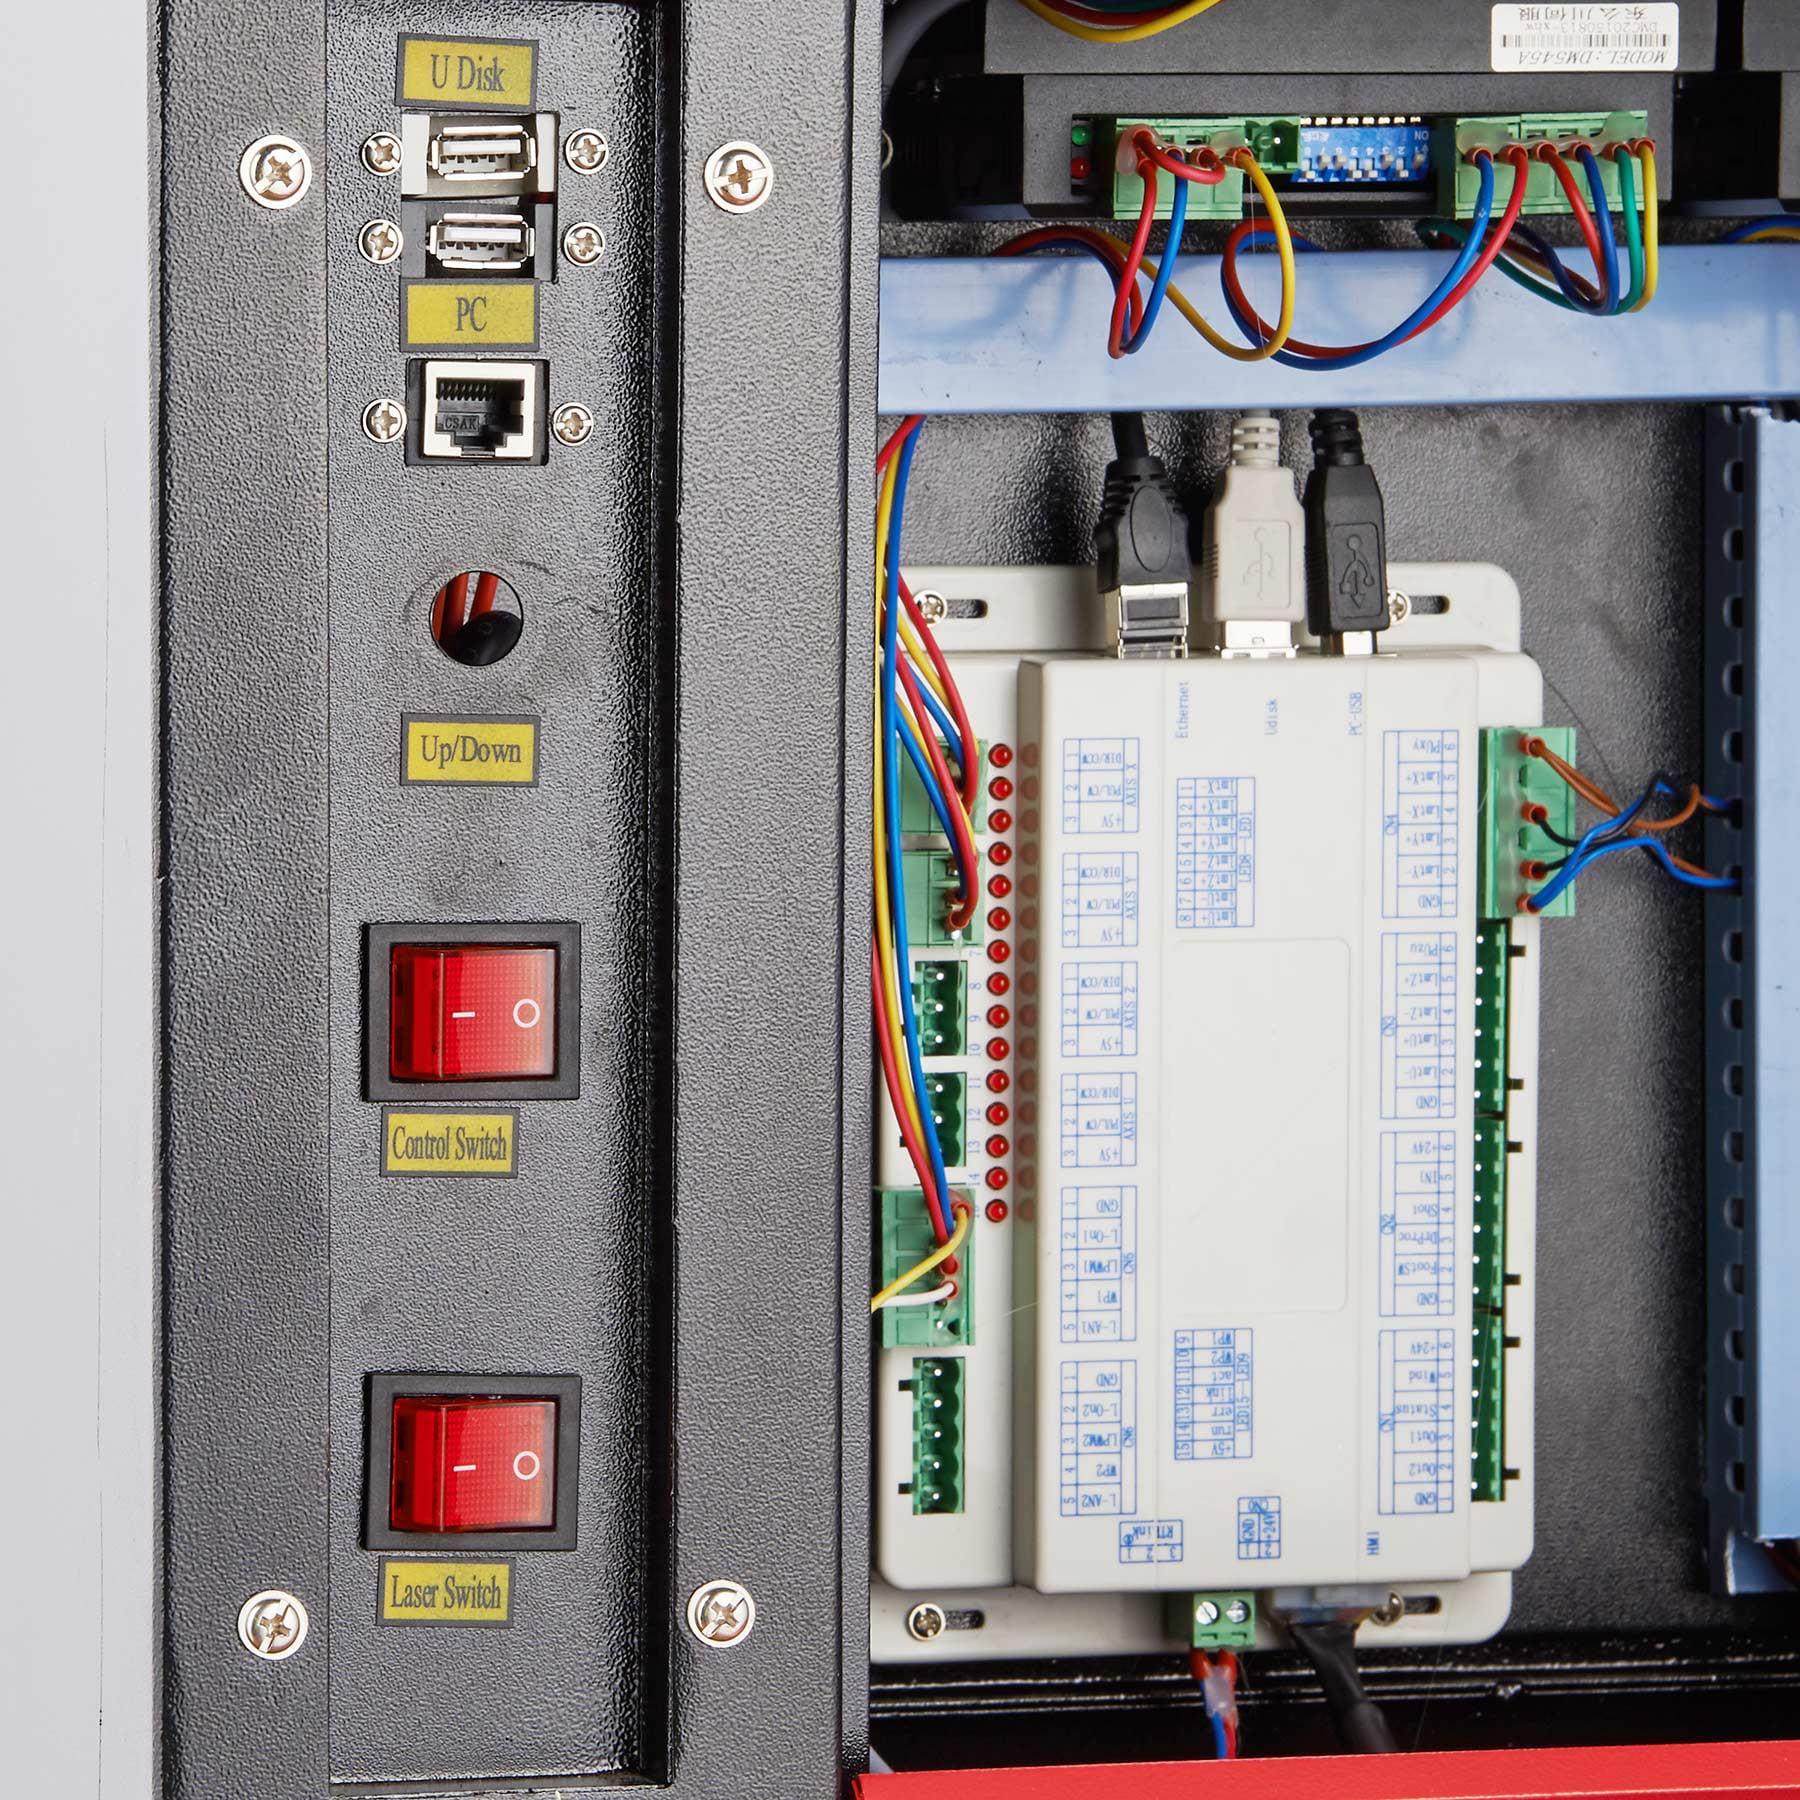 60w CO2 Laser Engraving & Cutting Professional Engraver Machine